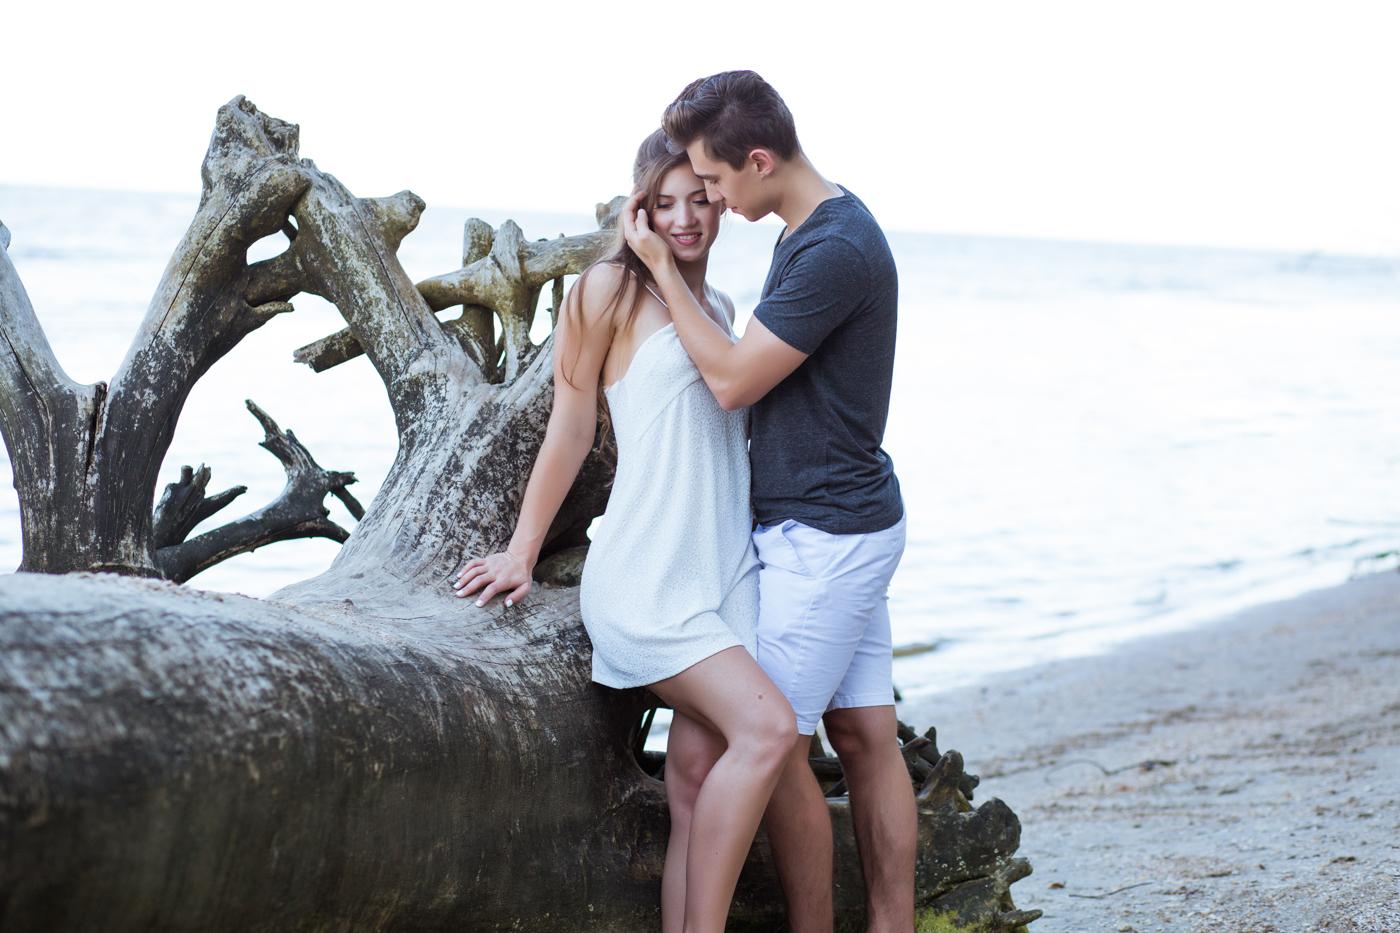 summer-beach-engagement-shoot-ksenia-pro-photography-33